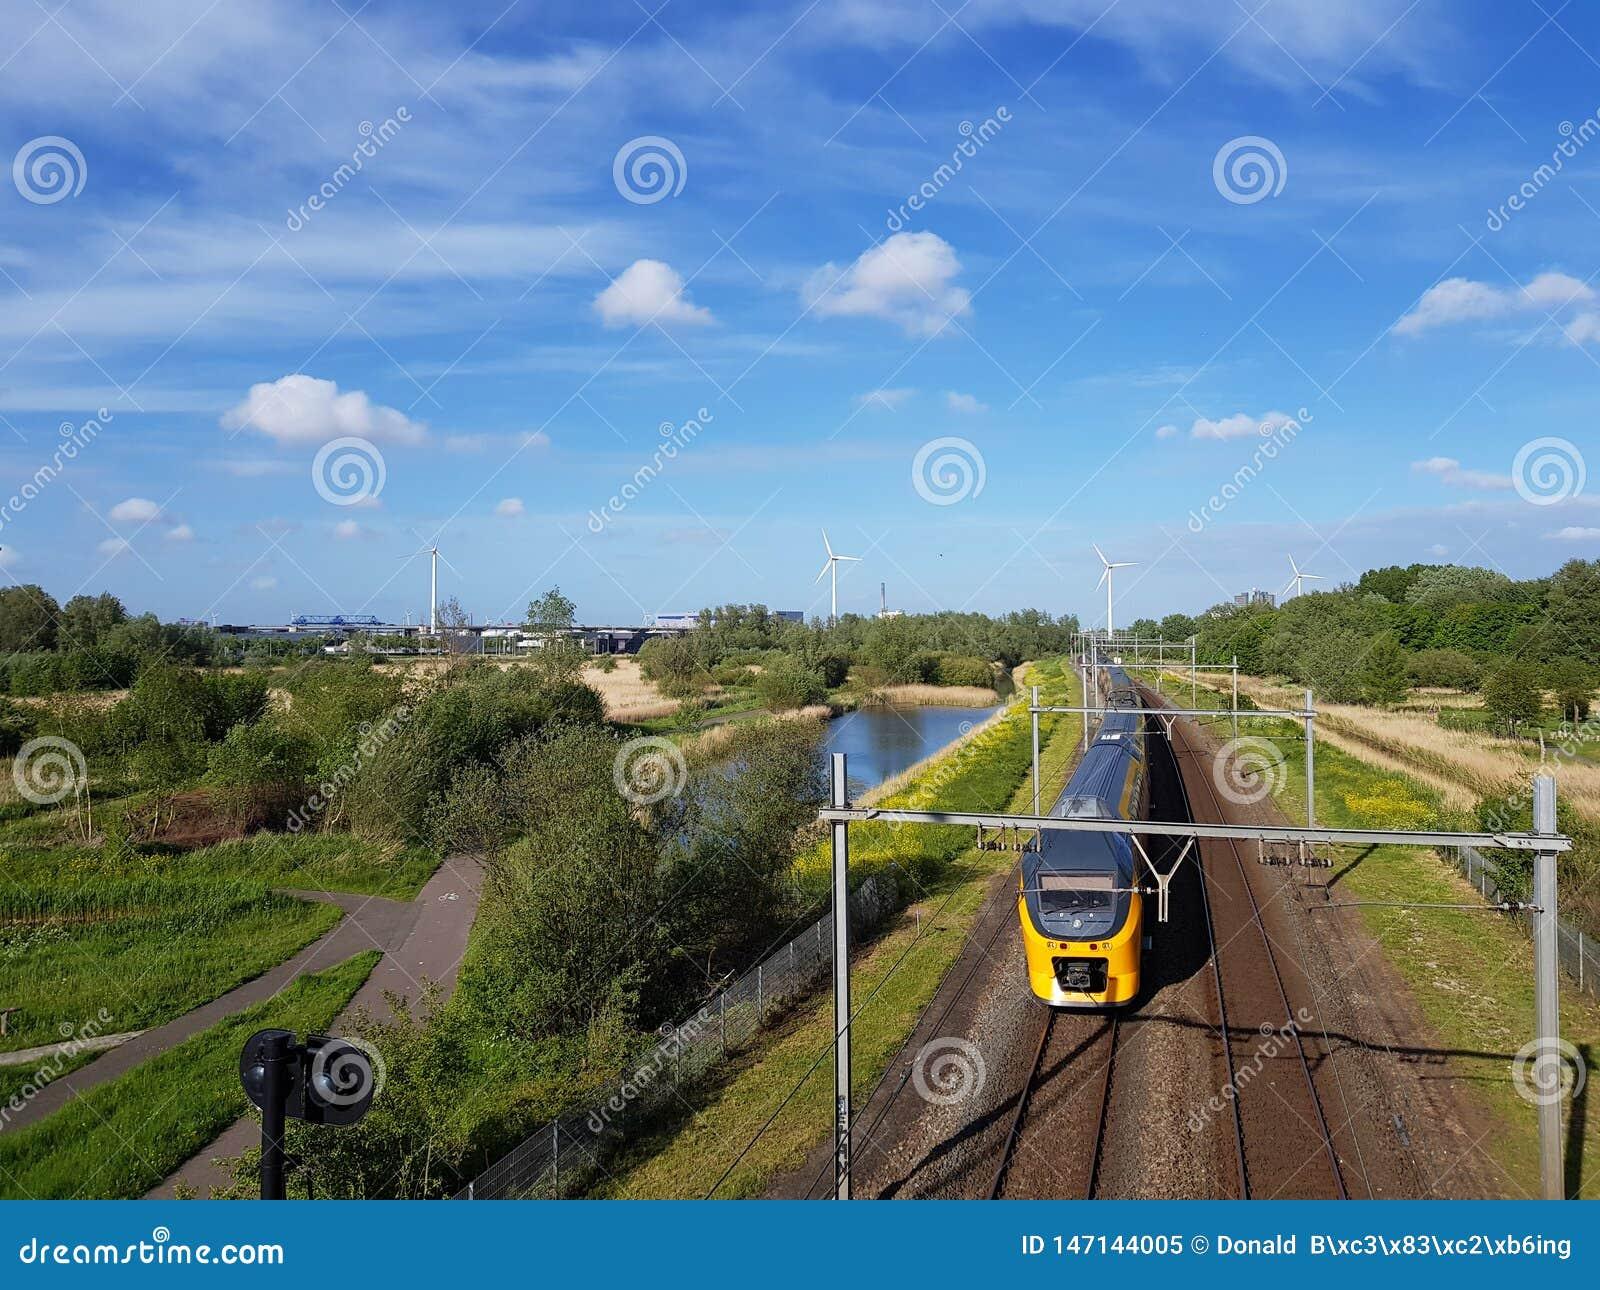 Intercity τραίνο στη διαδρομή σιδηροδρόμων με την αποζημίωση φύσης και ανεμοστρόβιλοι που παράγουν την πράσινη ενέργεια